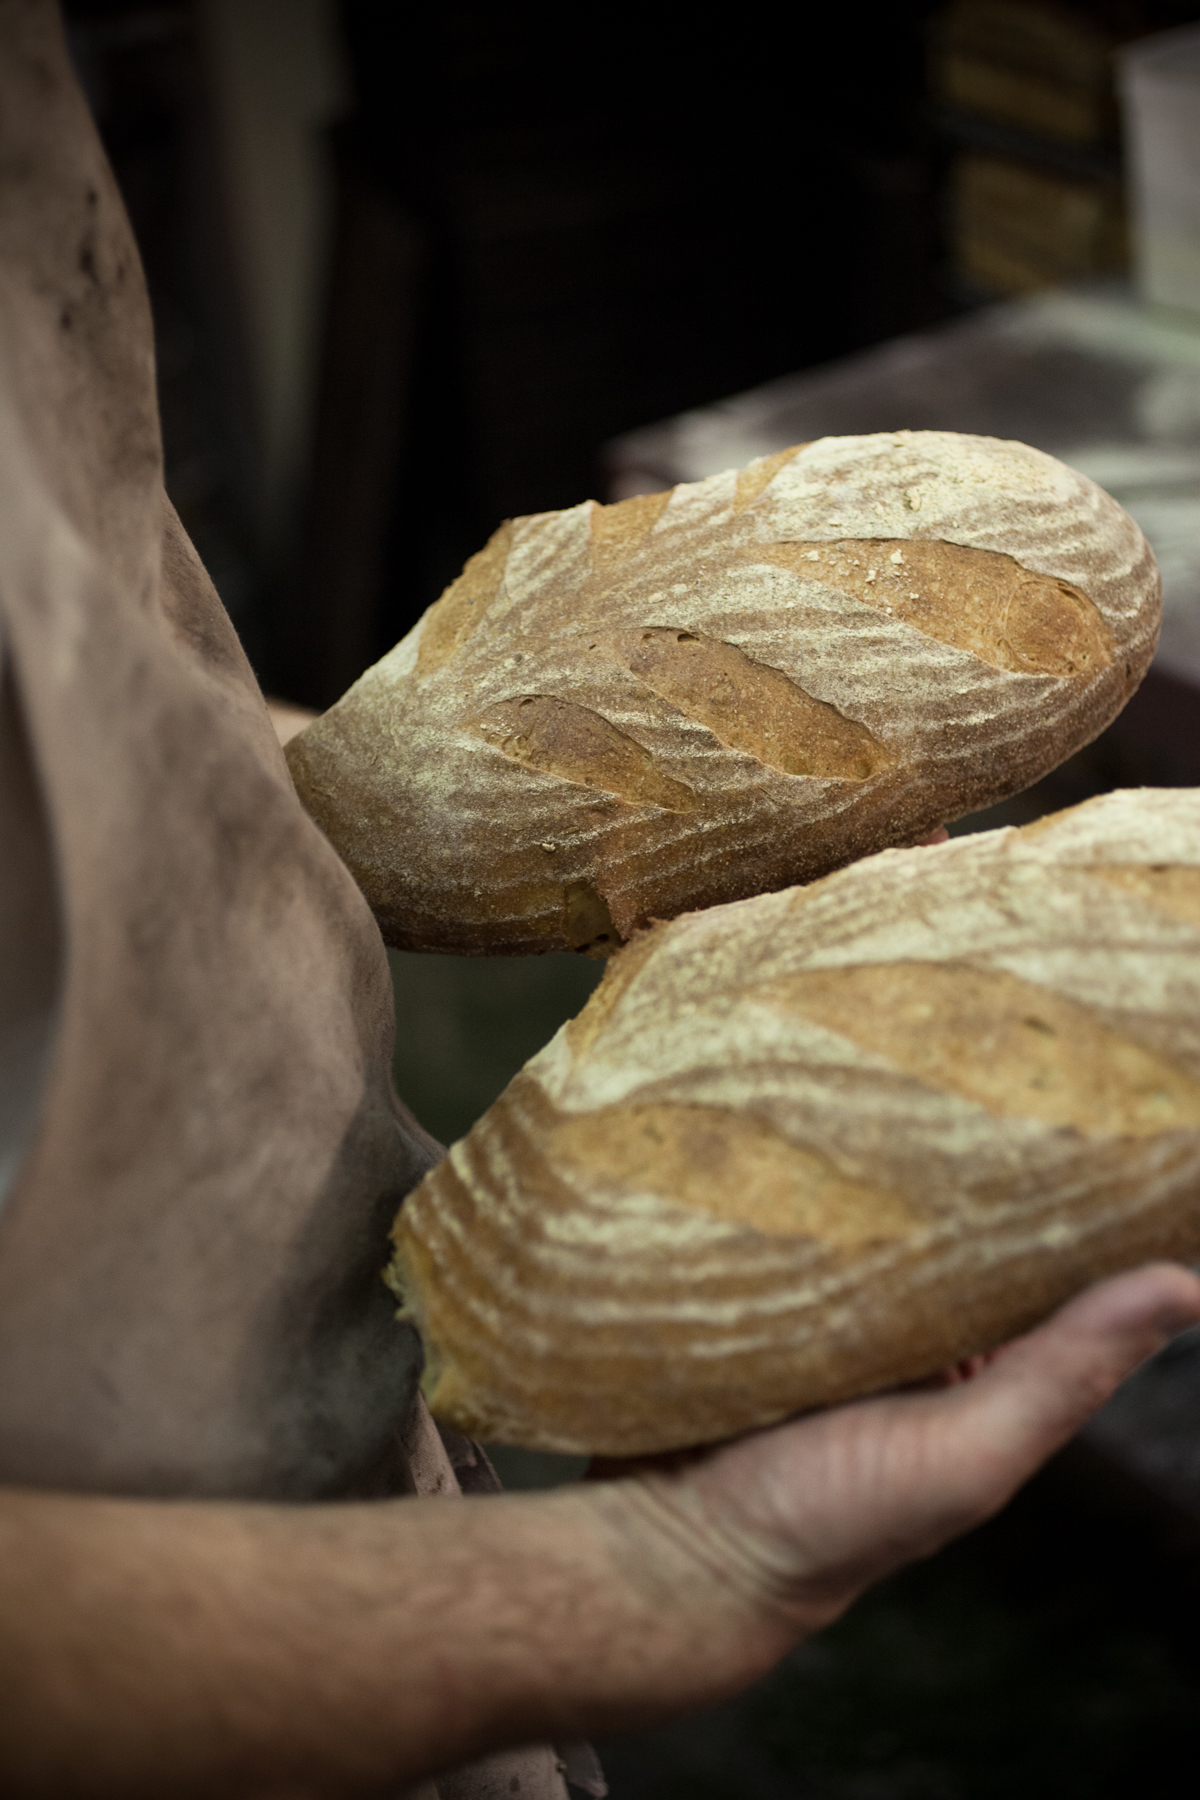 Chefs & Cooks Sourdough Baking